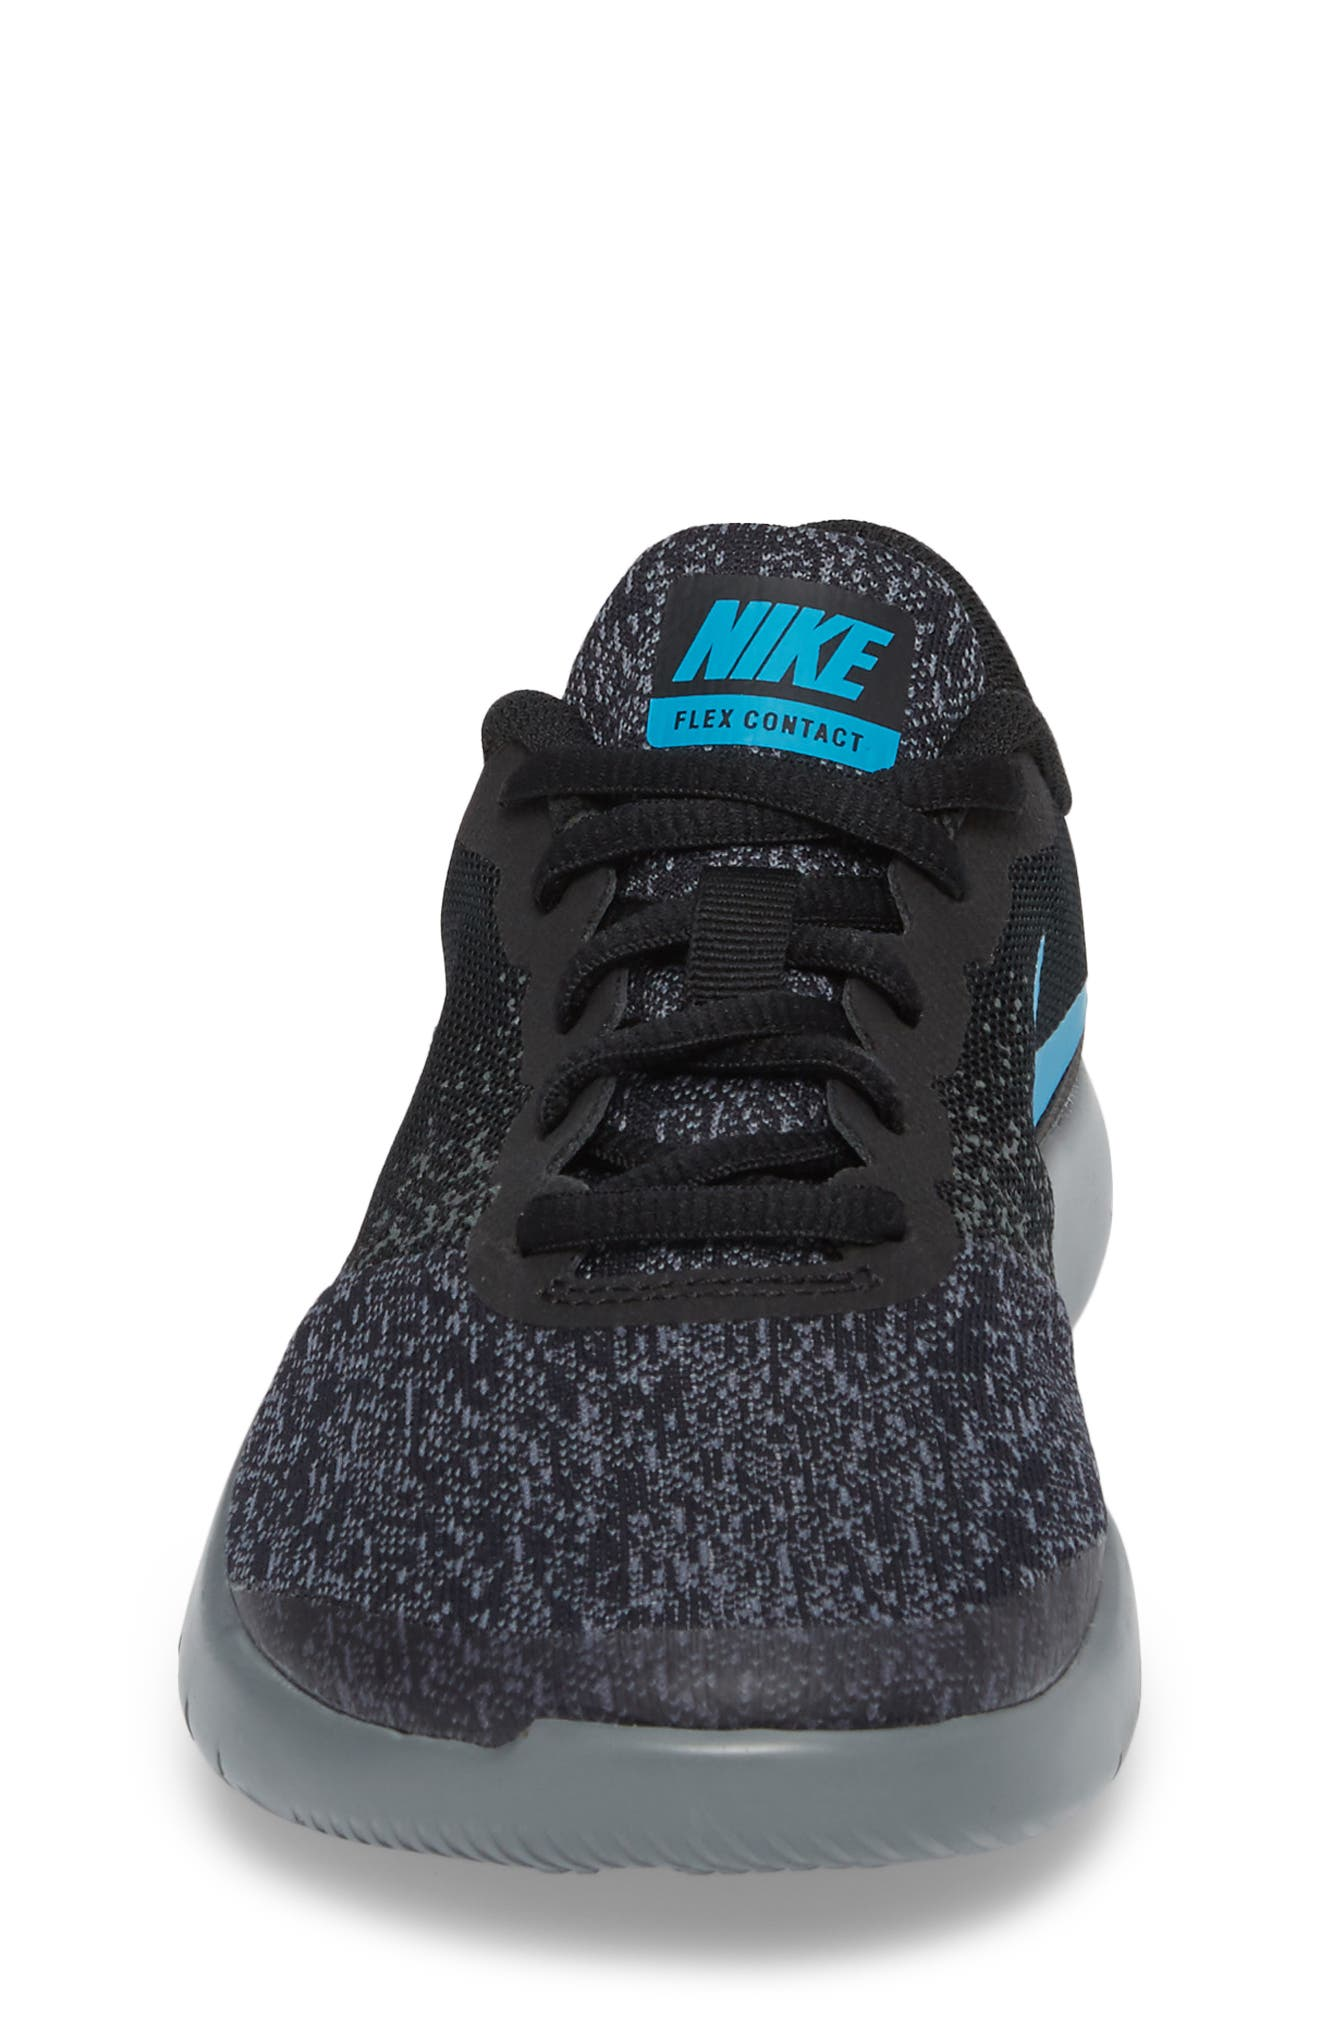 Flex Contact Running Shoe,                             Alternate thumbnail 4, color,                             007